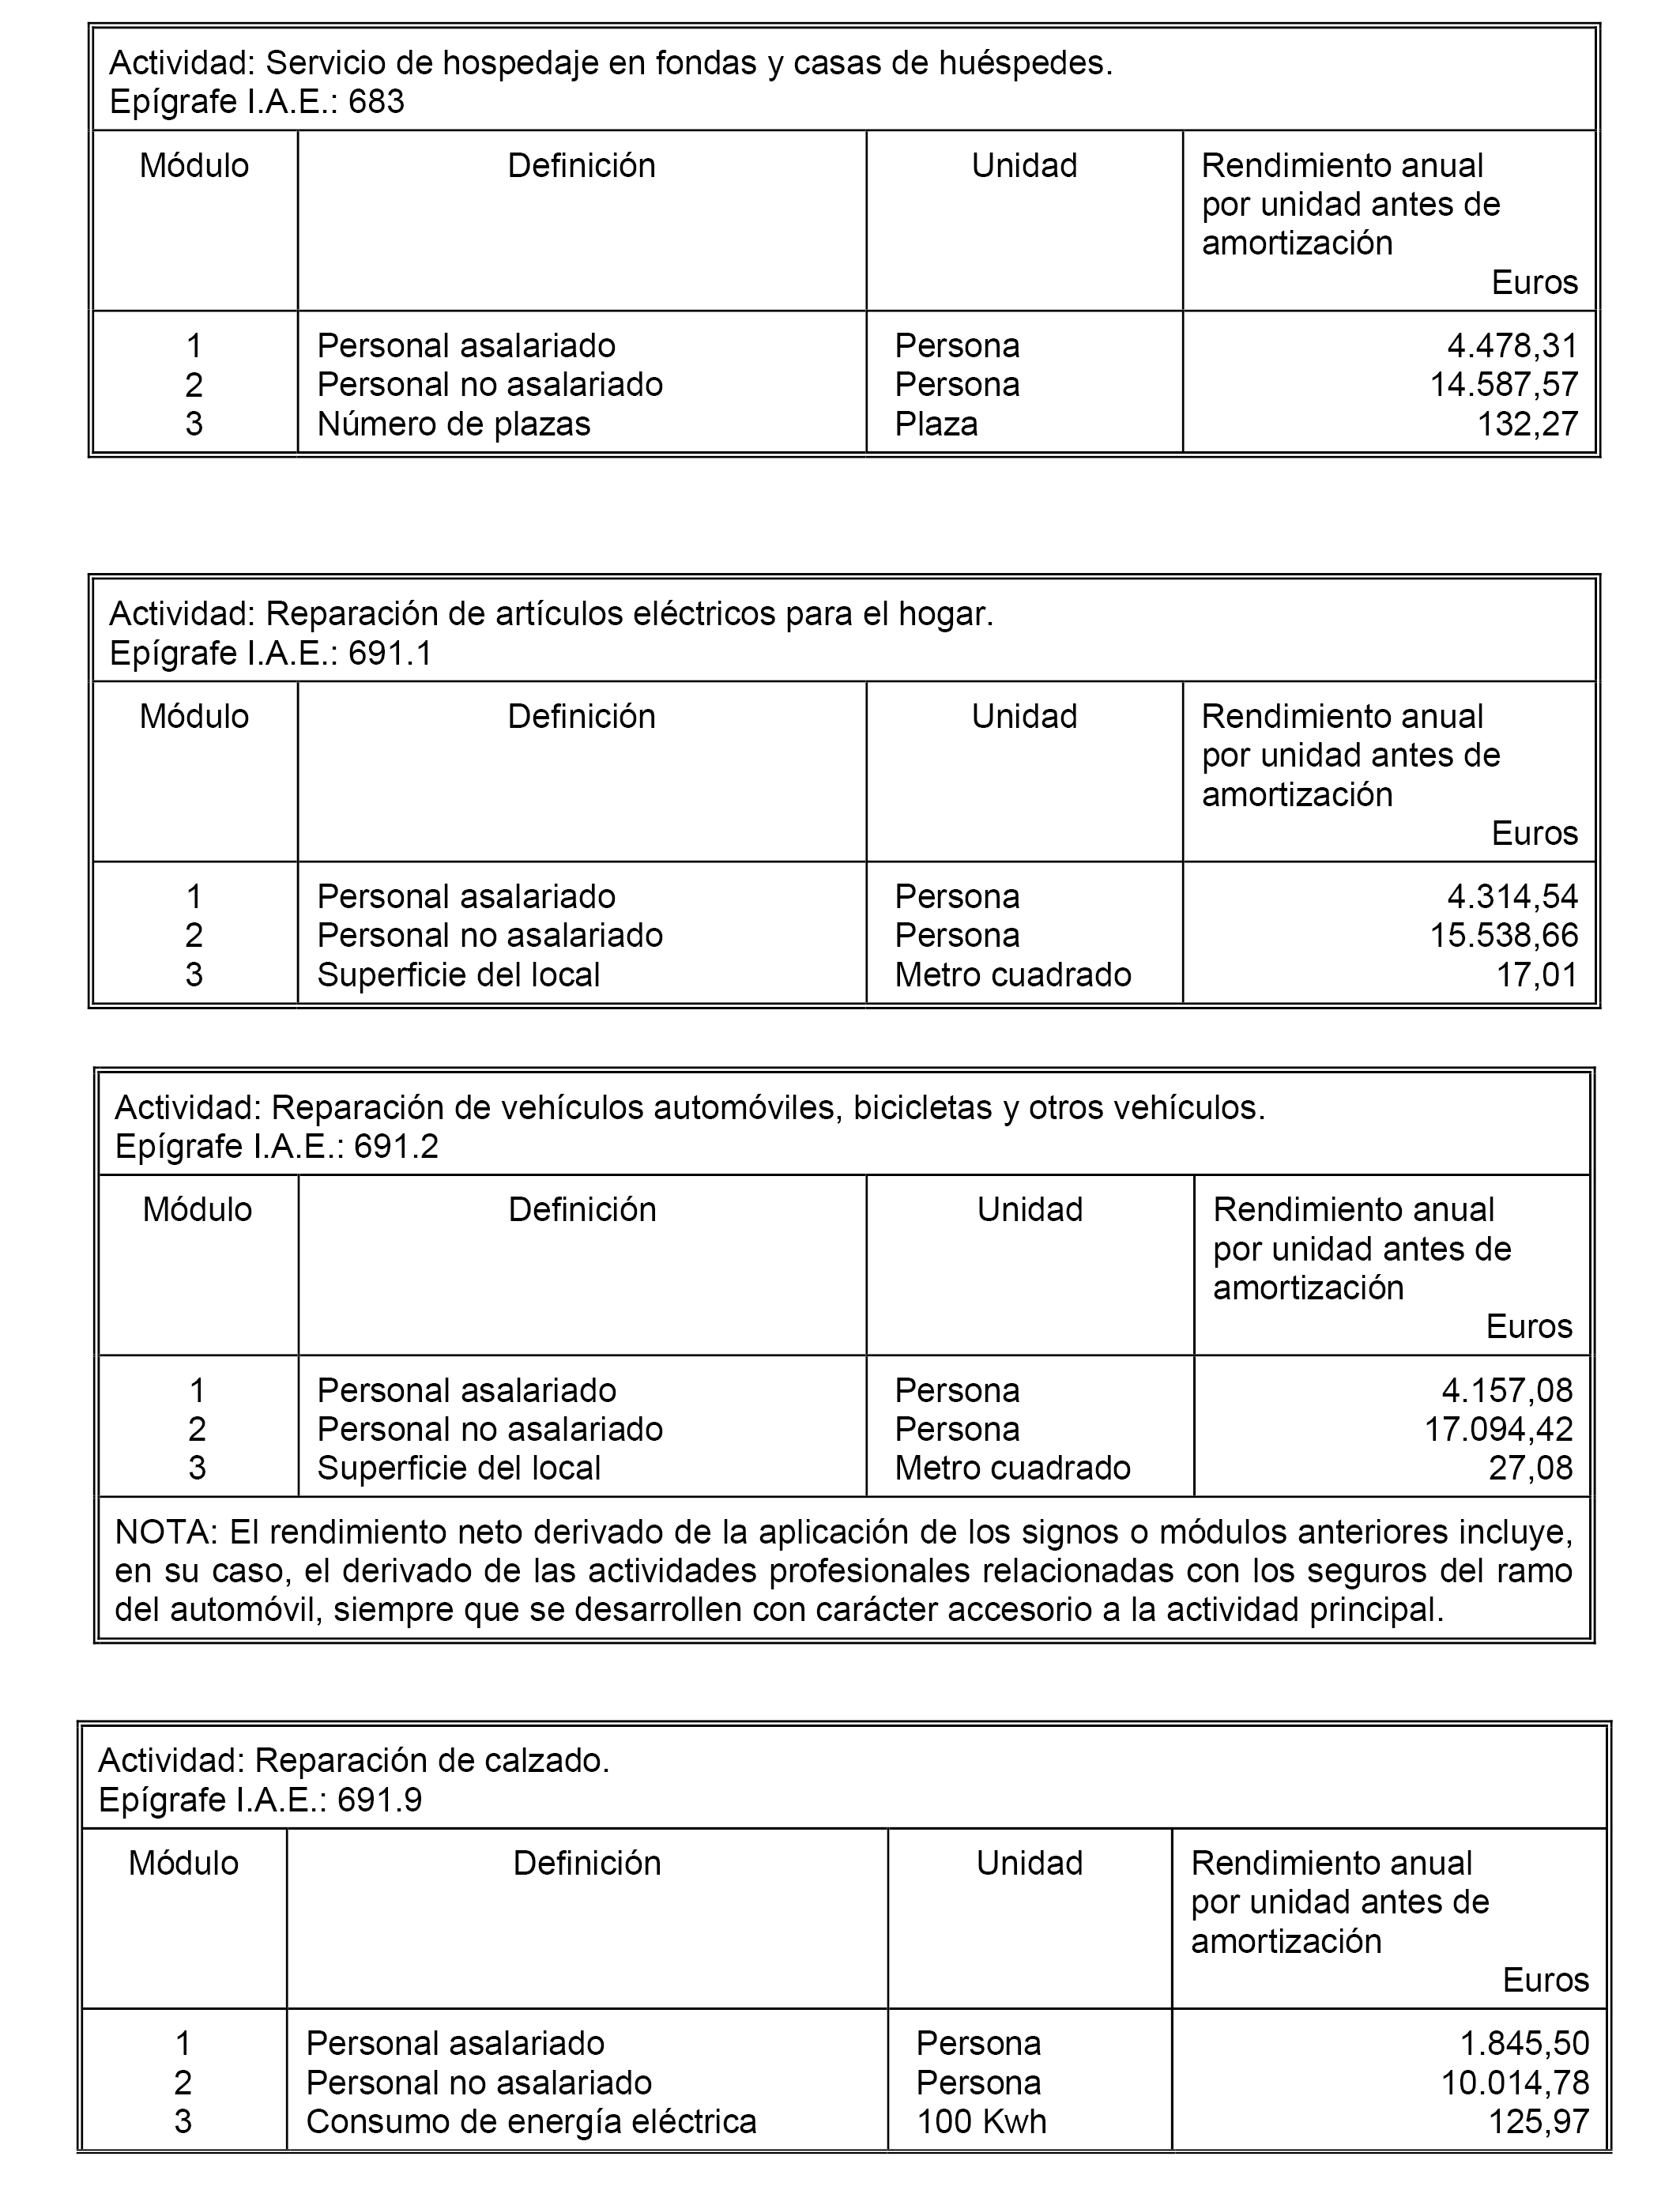 BOE.es - Documento BOE-A-2016-11252